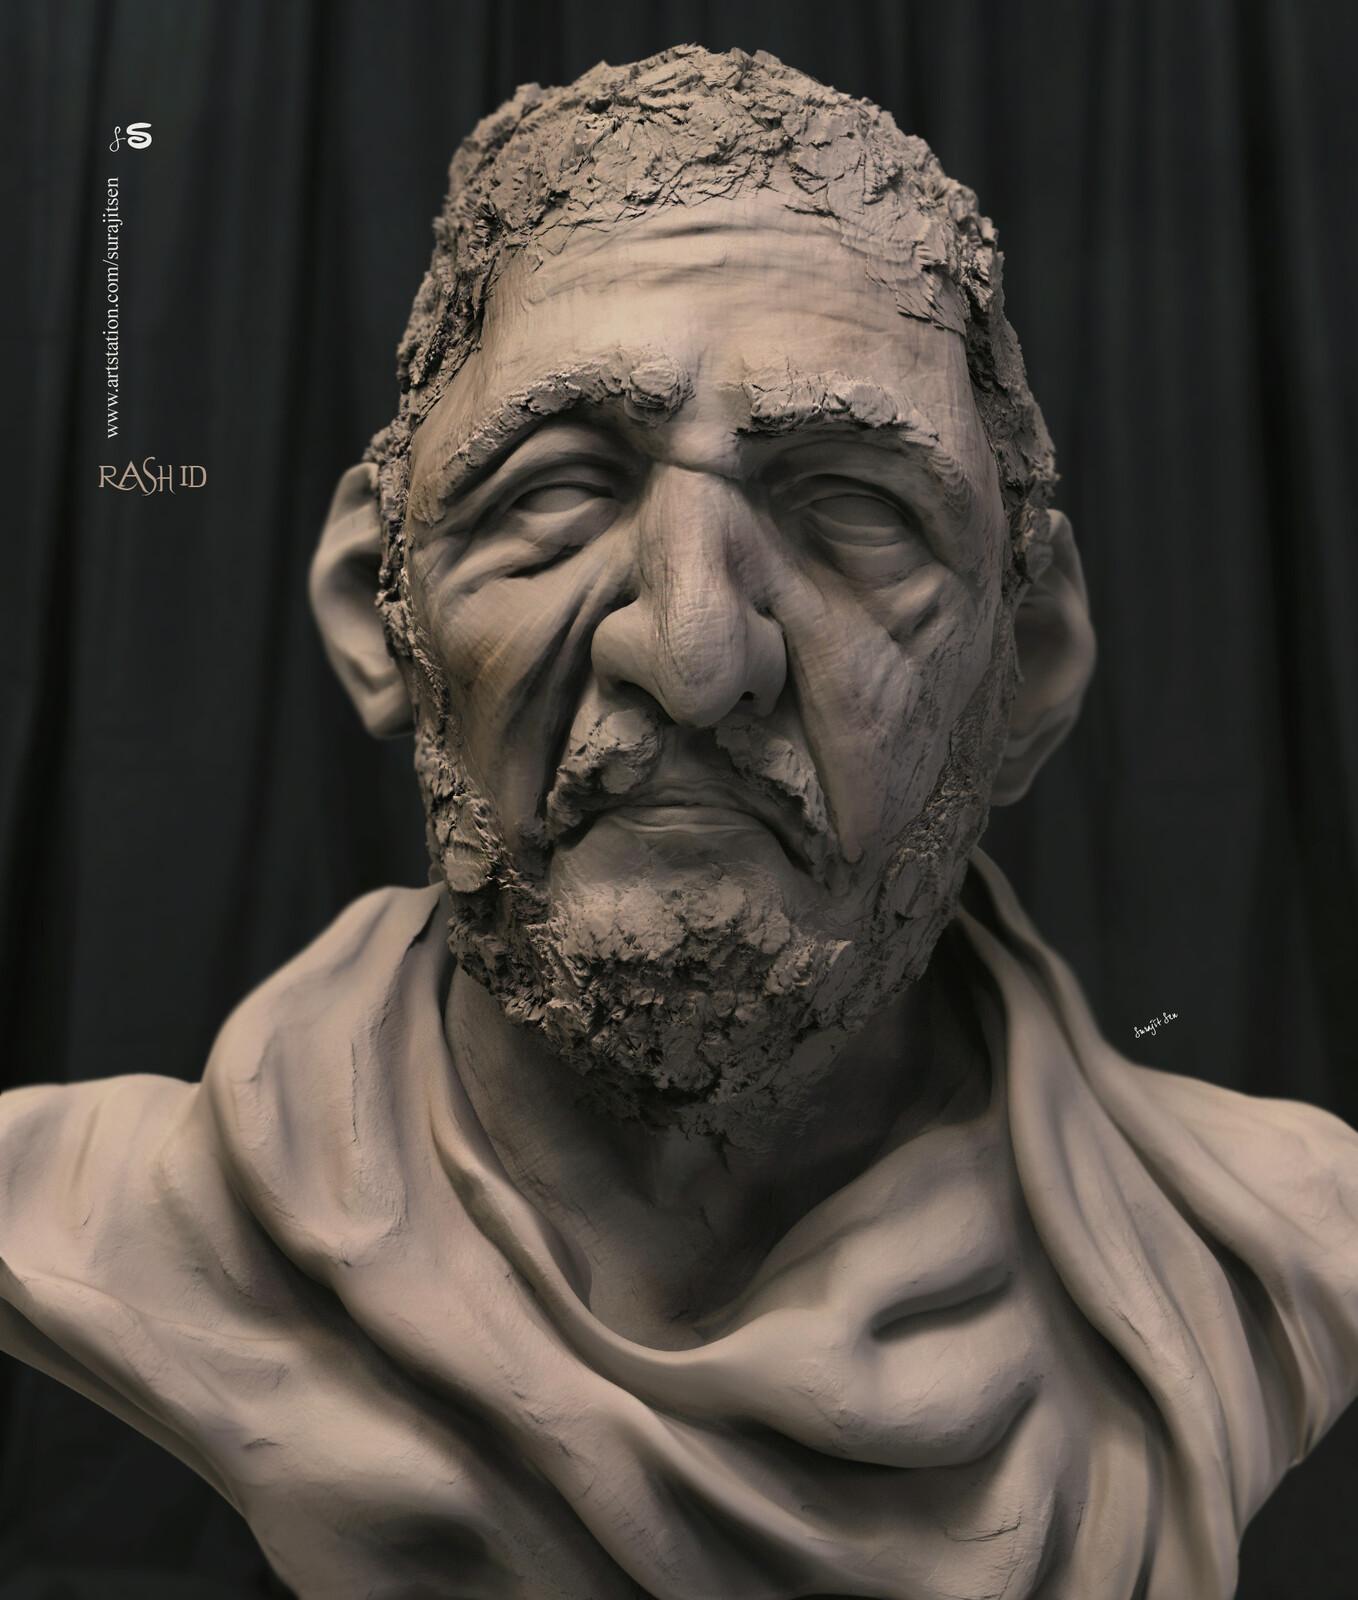 One of my Digital Sculpture. Rashid.